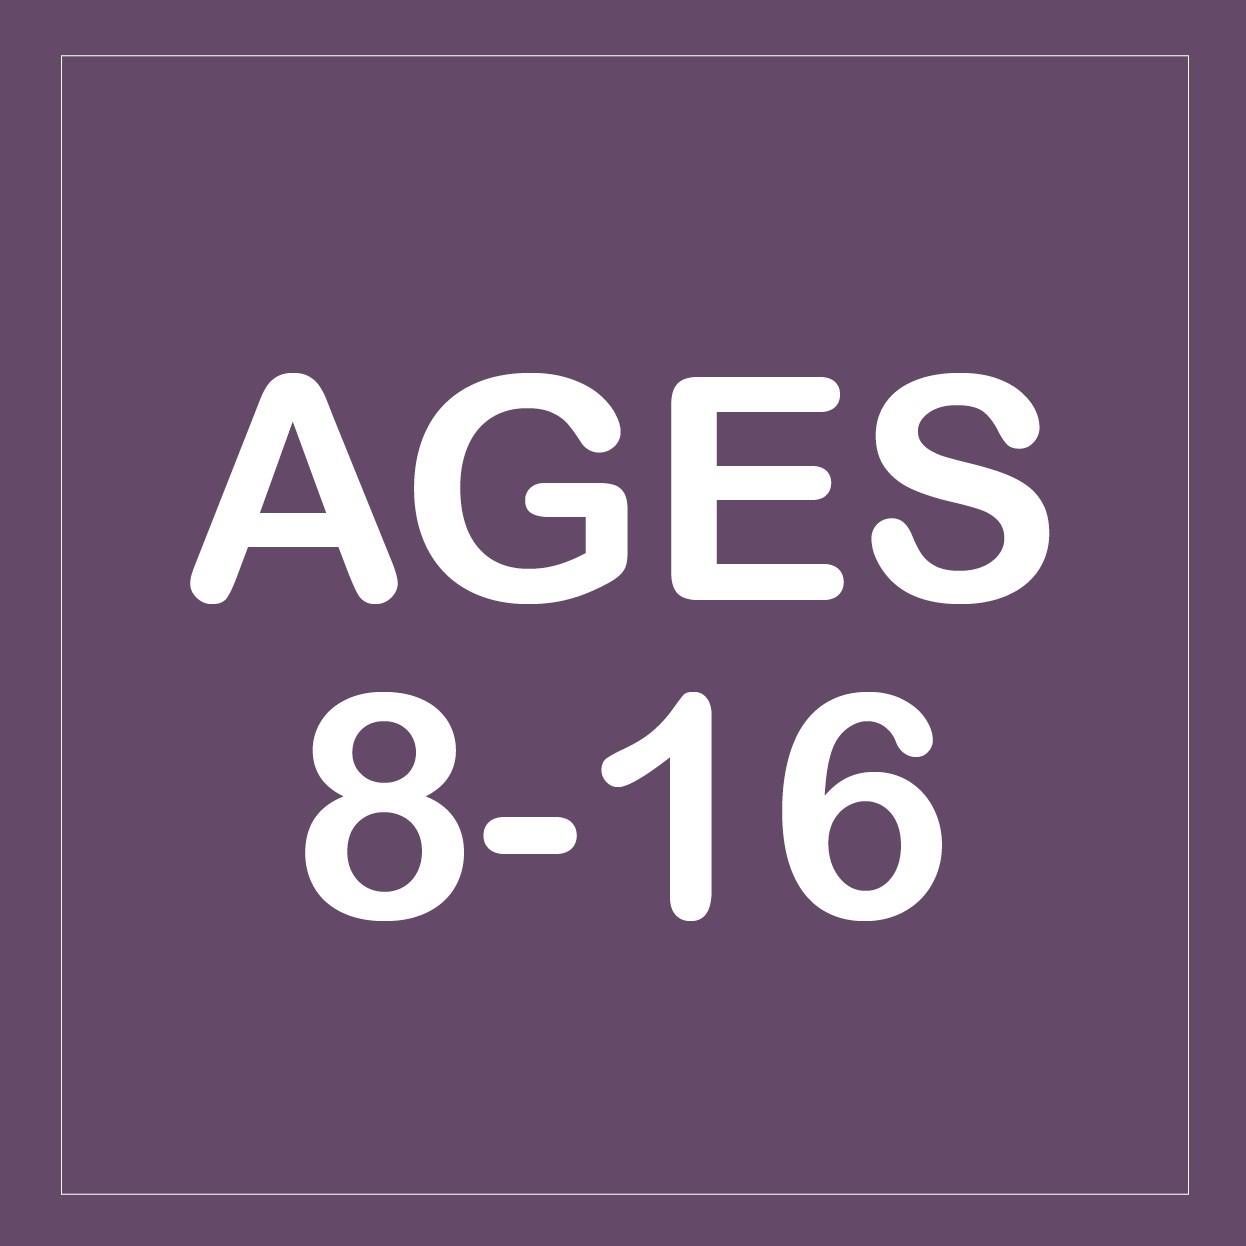 Age 8 - 16